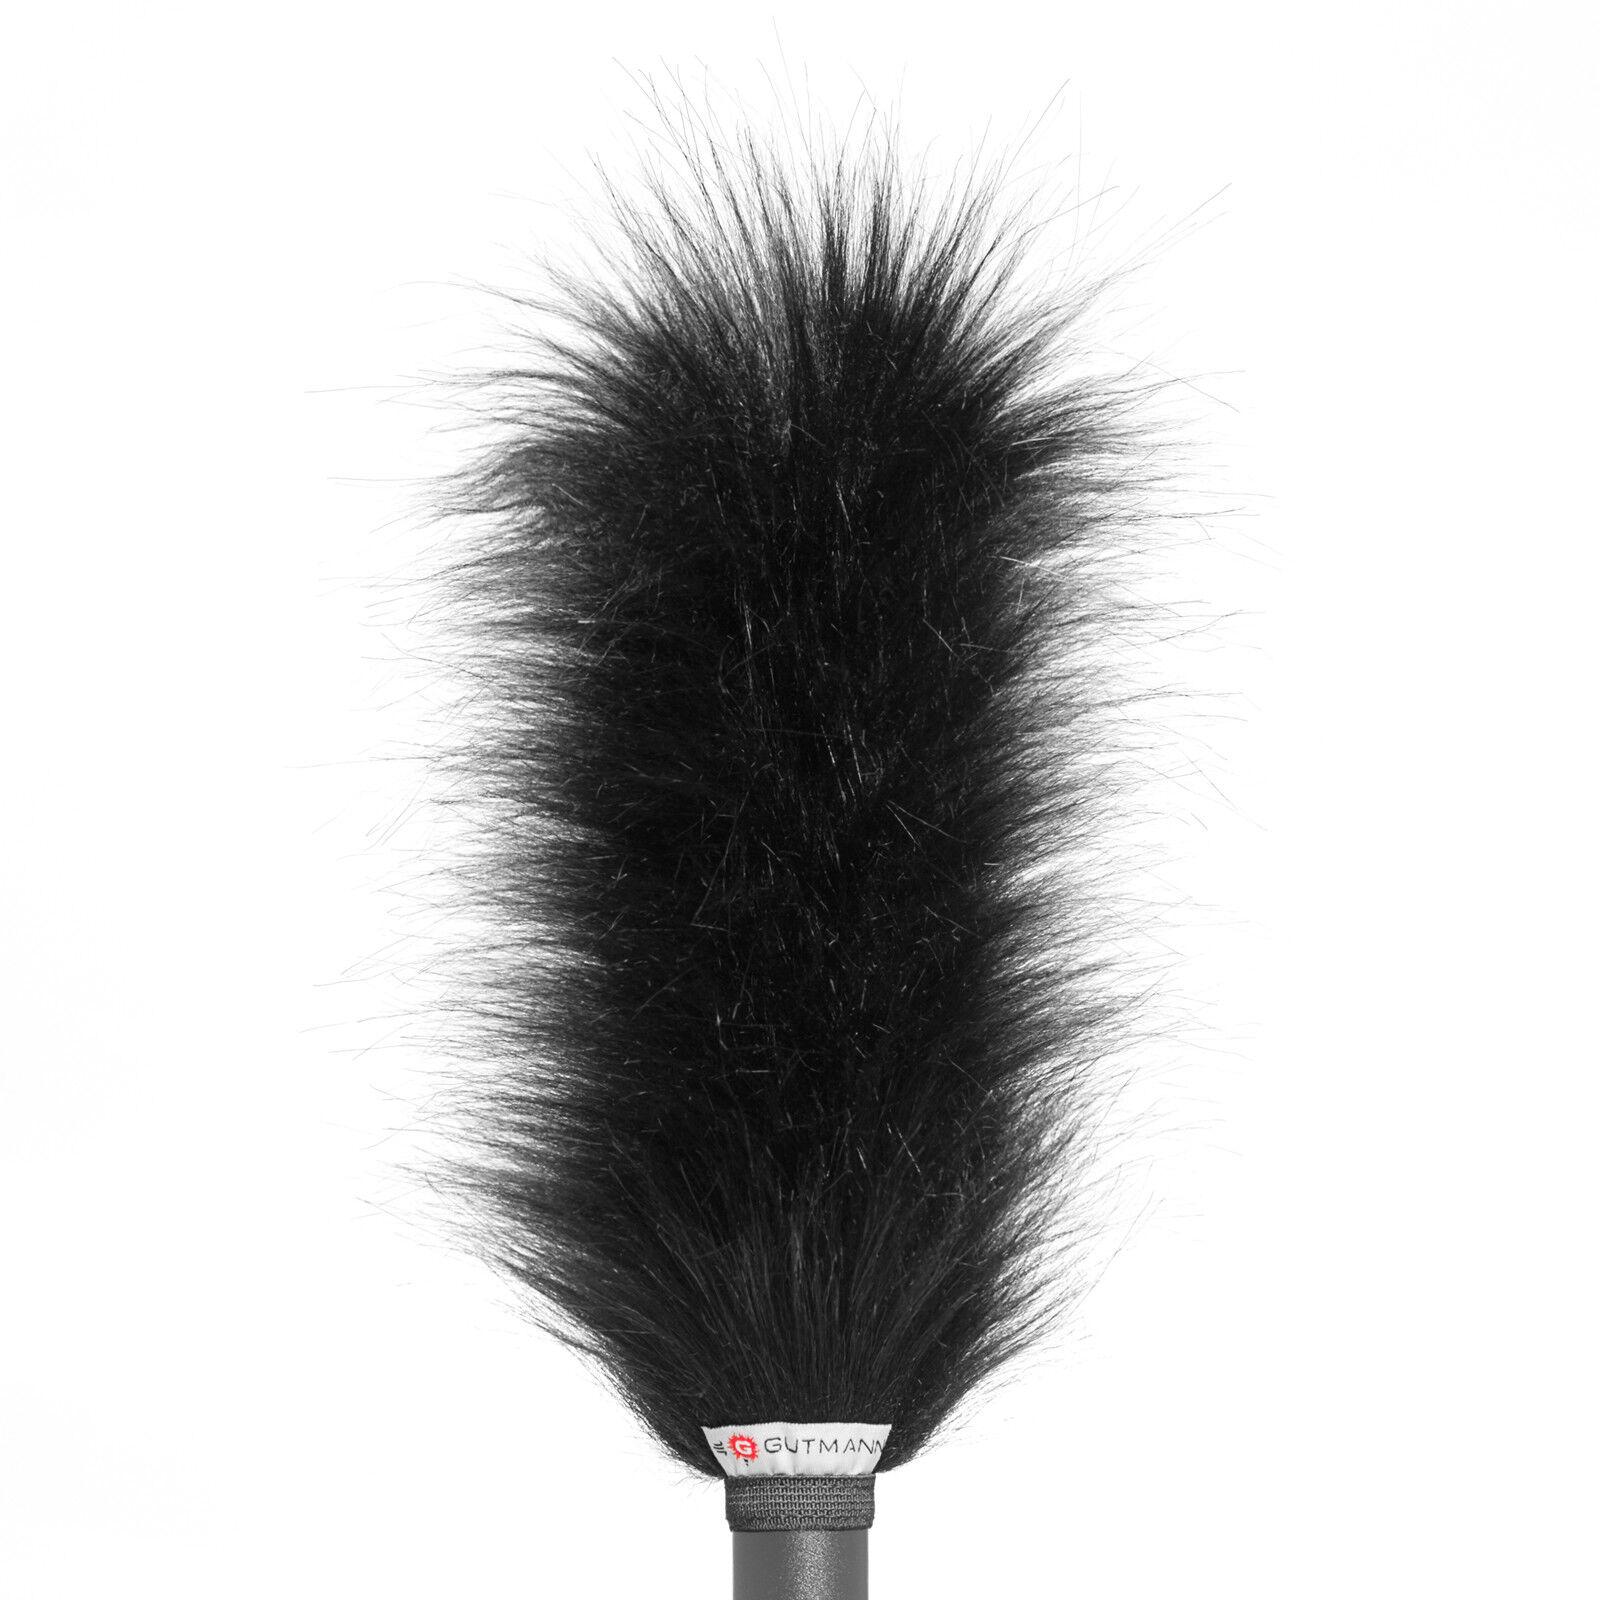 Gutmann Microphone Wind Protector For T. Bone Em 700